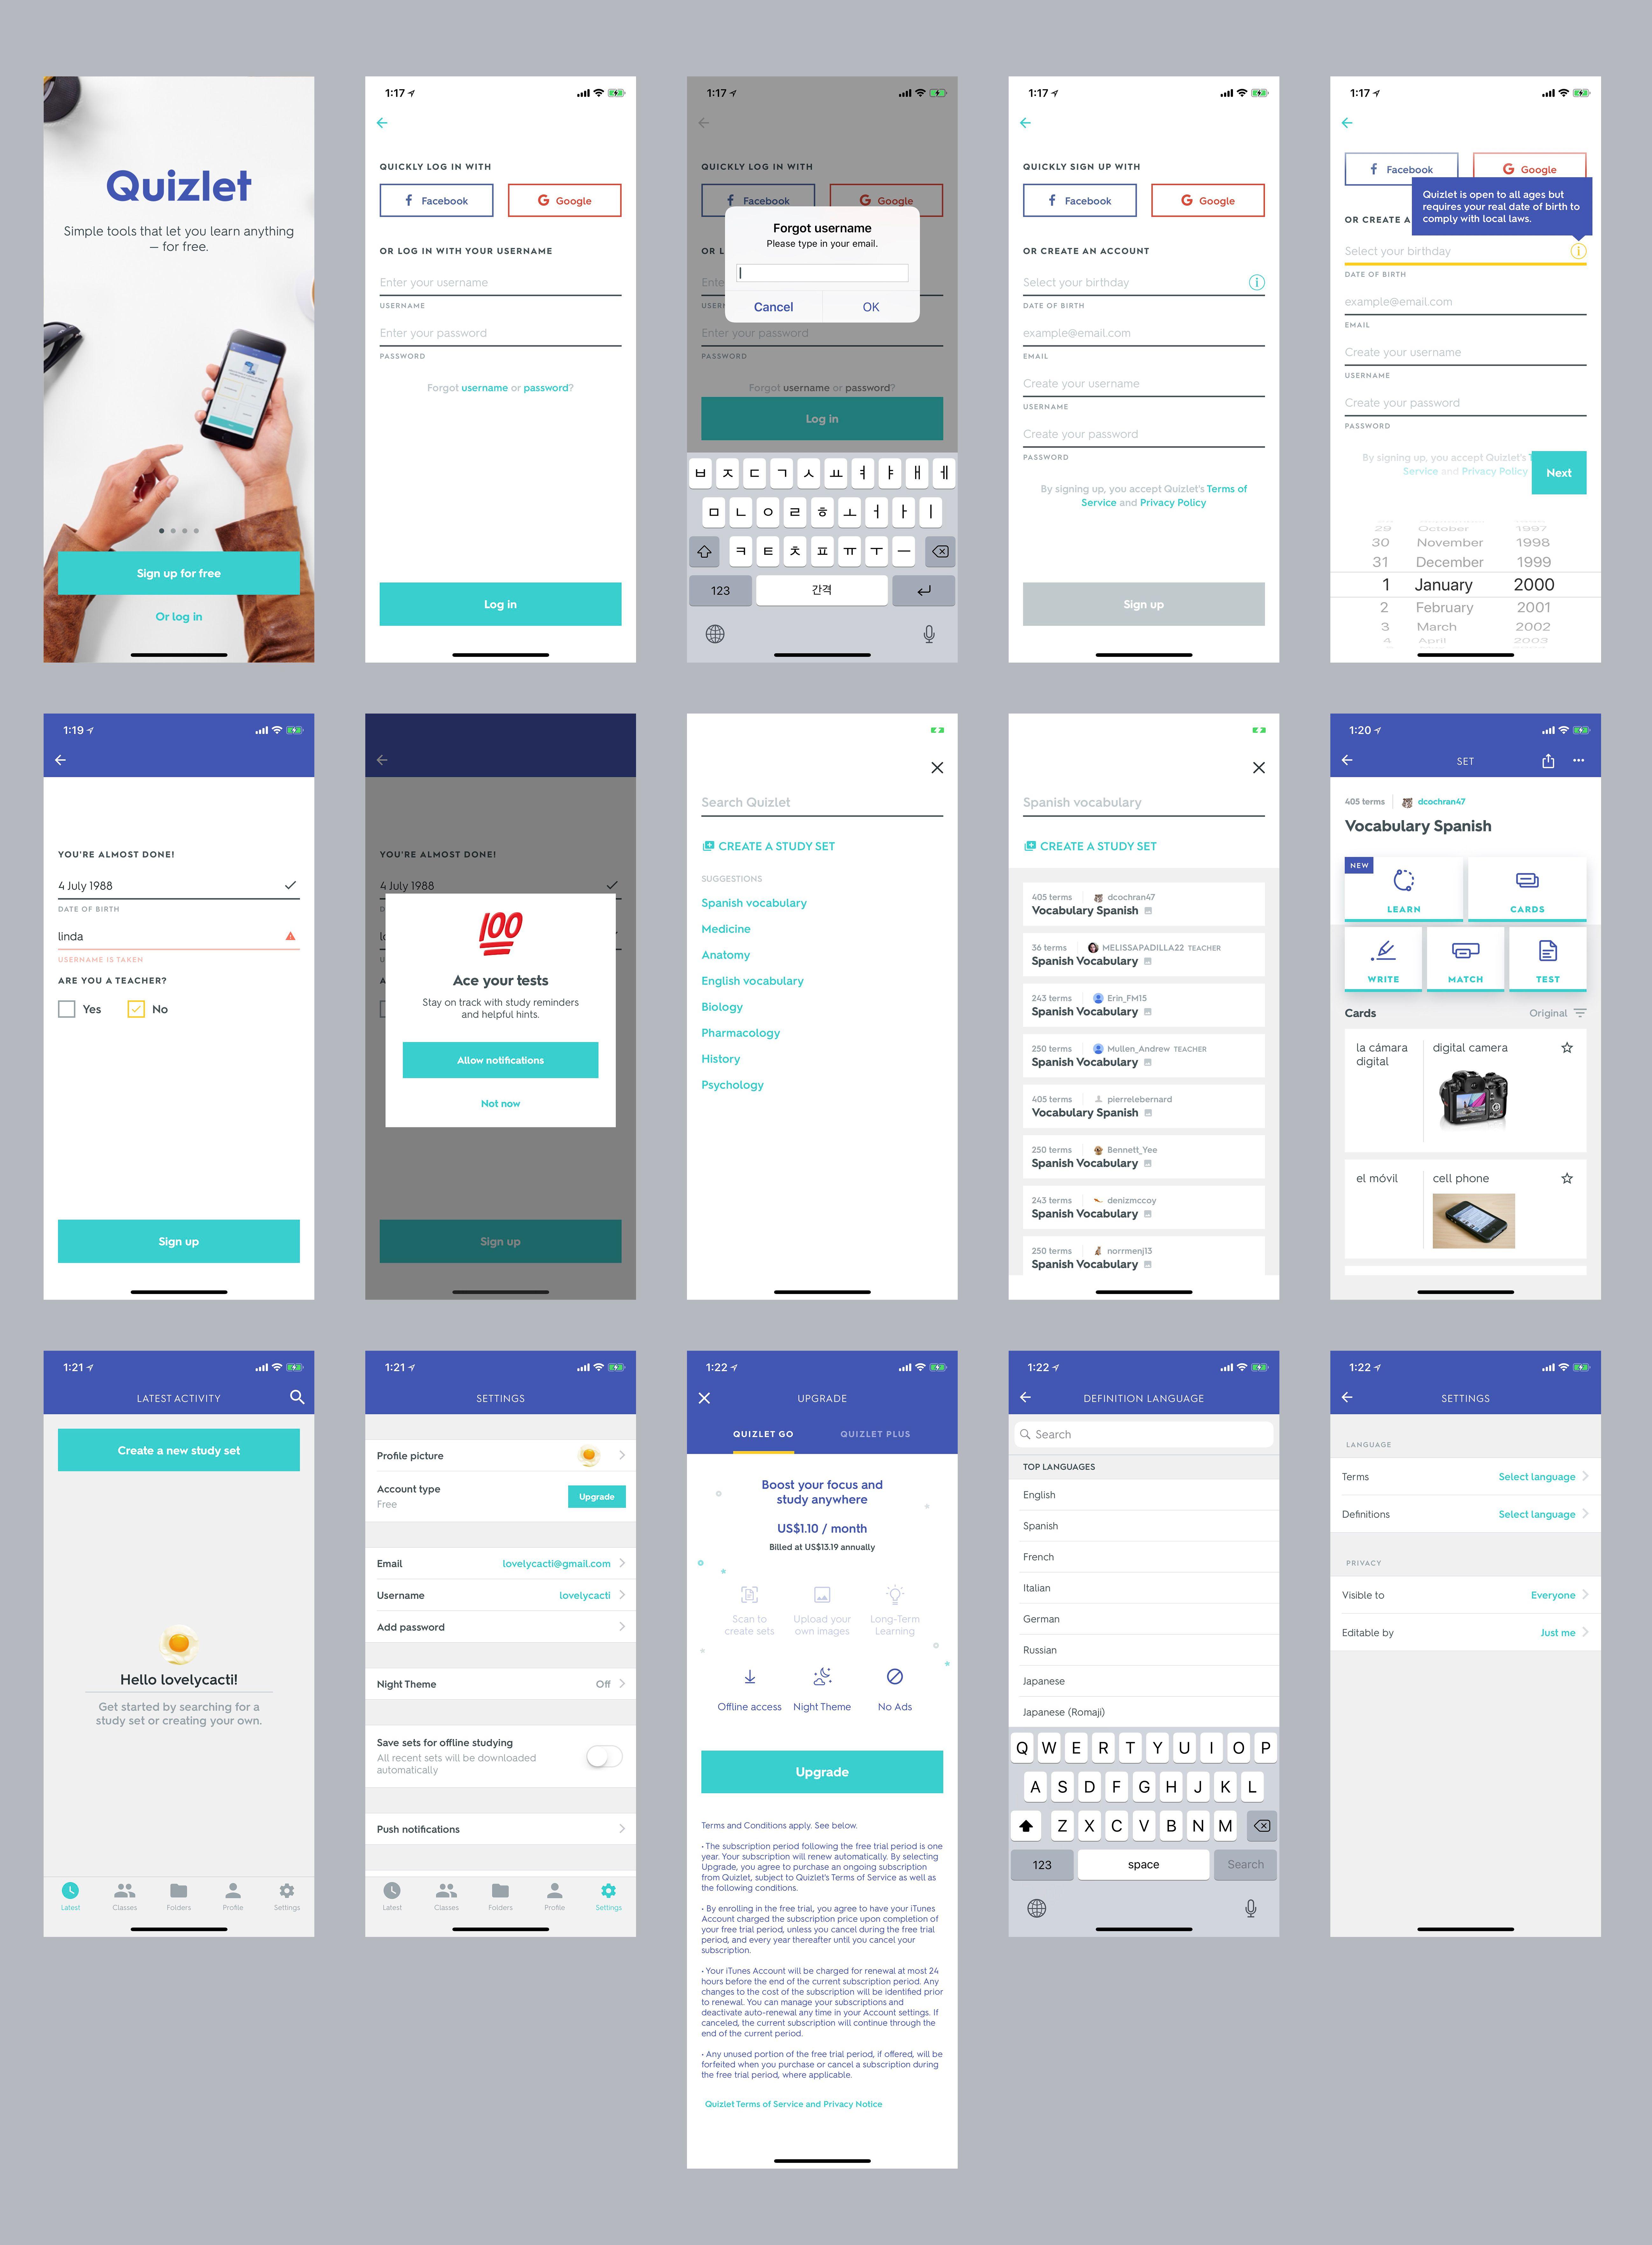 Quizlet Ios App Search Optimization Ios App Design Search Engine Optimization Seo